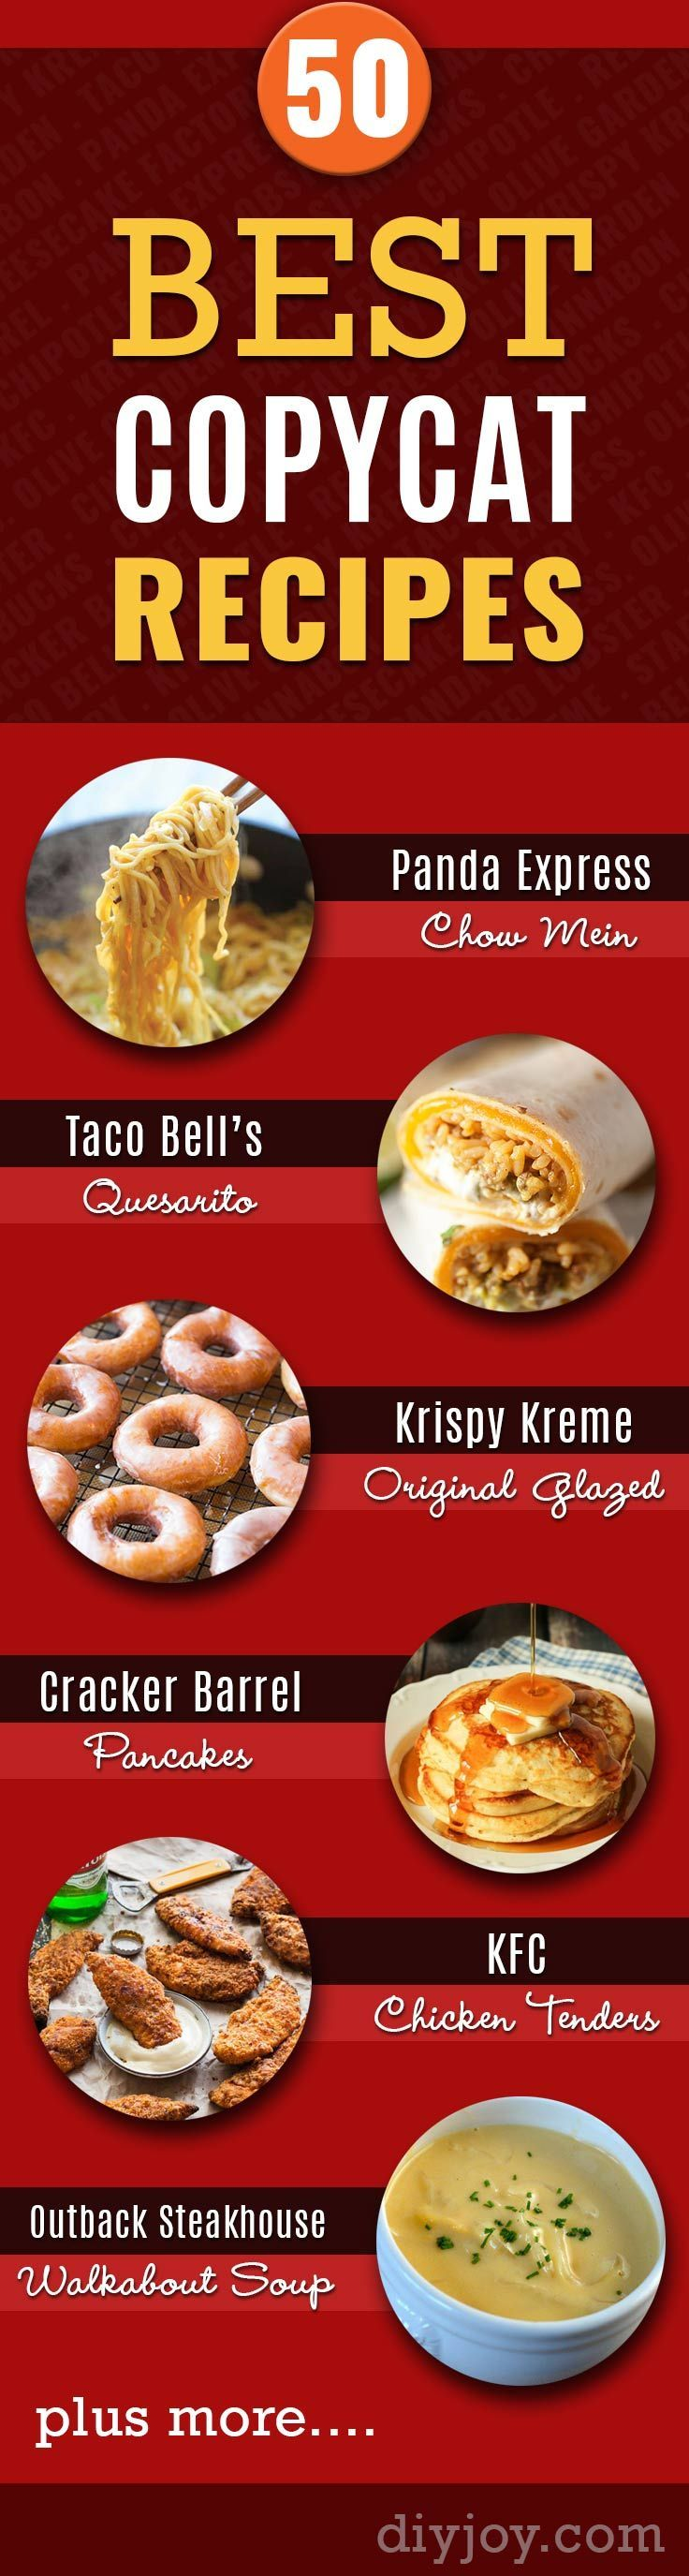 Best Copycat Recipes From Top Restaurants. Awesome Recipe Knockoffs from Chipotle, Starbucks, Olive Garden, Cinabbon, Cracker Barrel, Taco Bell, Cheesecake Factory, KFC, Mc Donalds, Red Lobster, Panda Express http://diyjoy.com/copycat-recipes